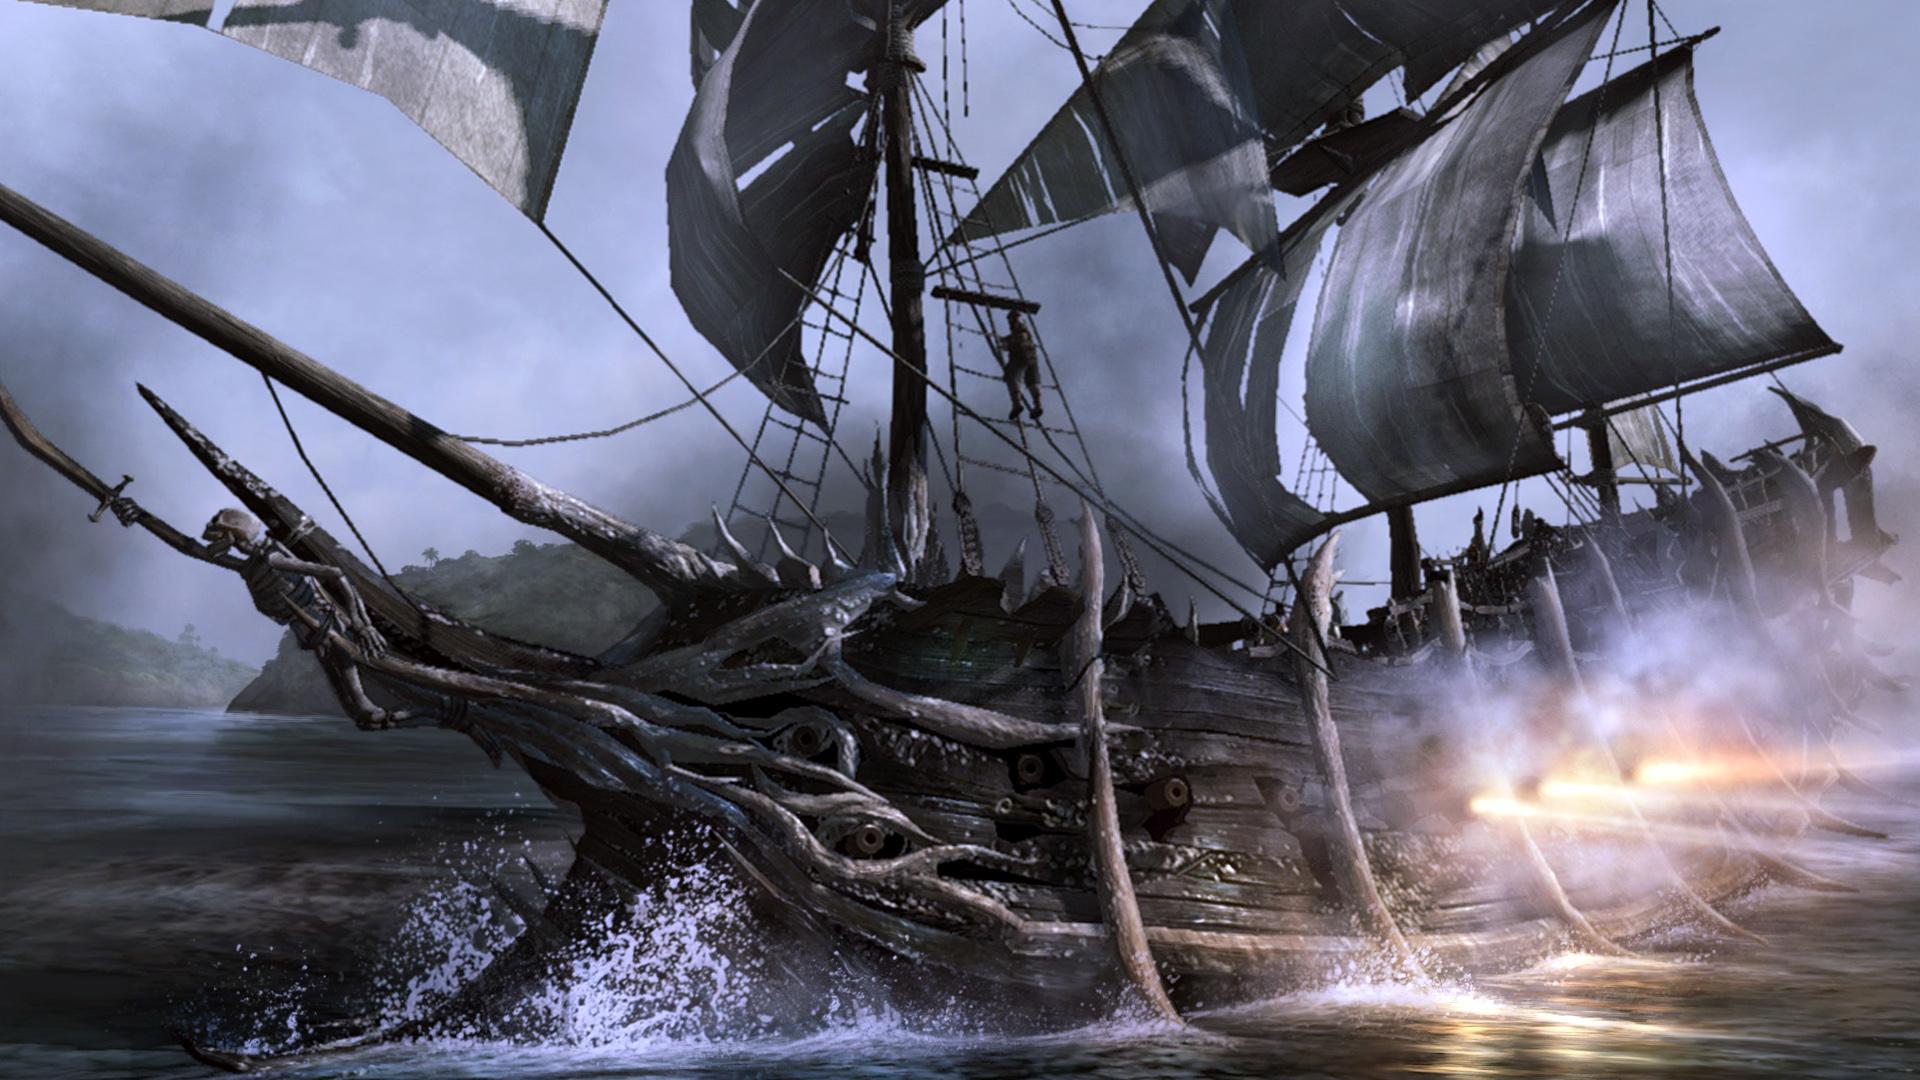 3D Pirate Ship Wallpaper on WallpaperSafari